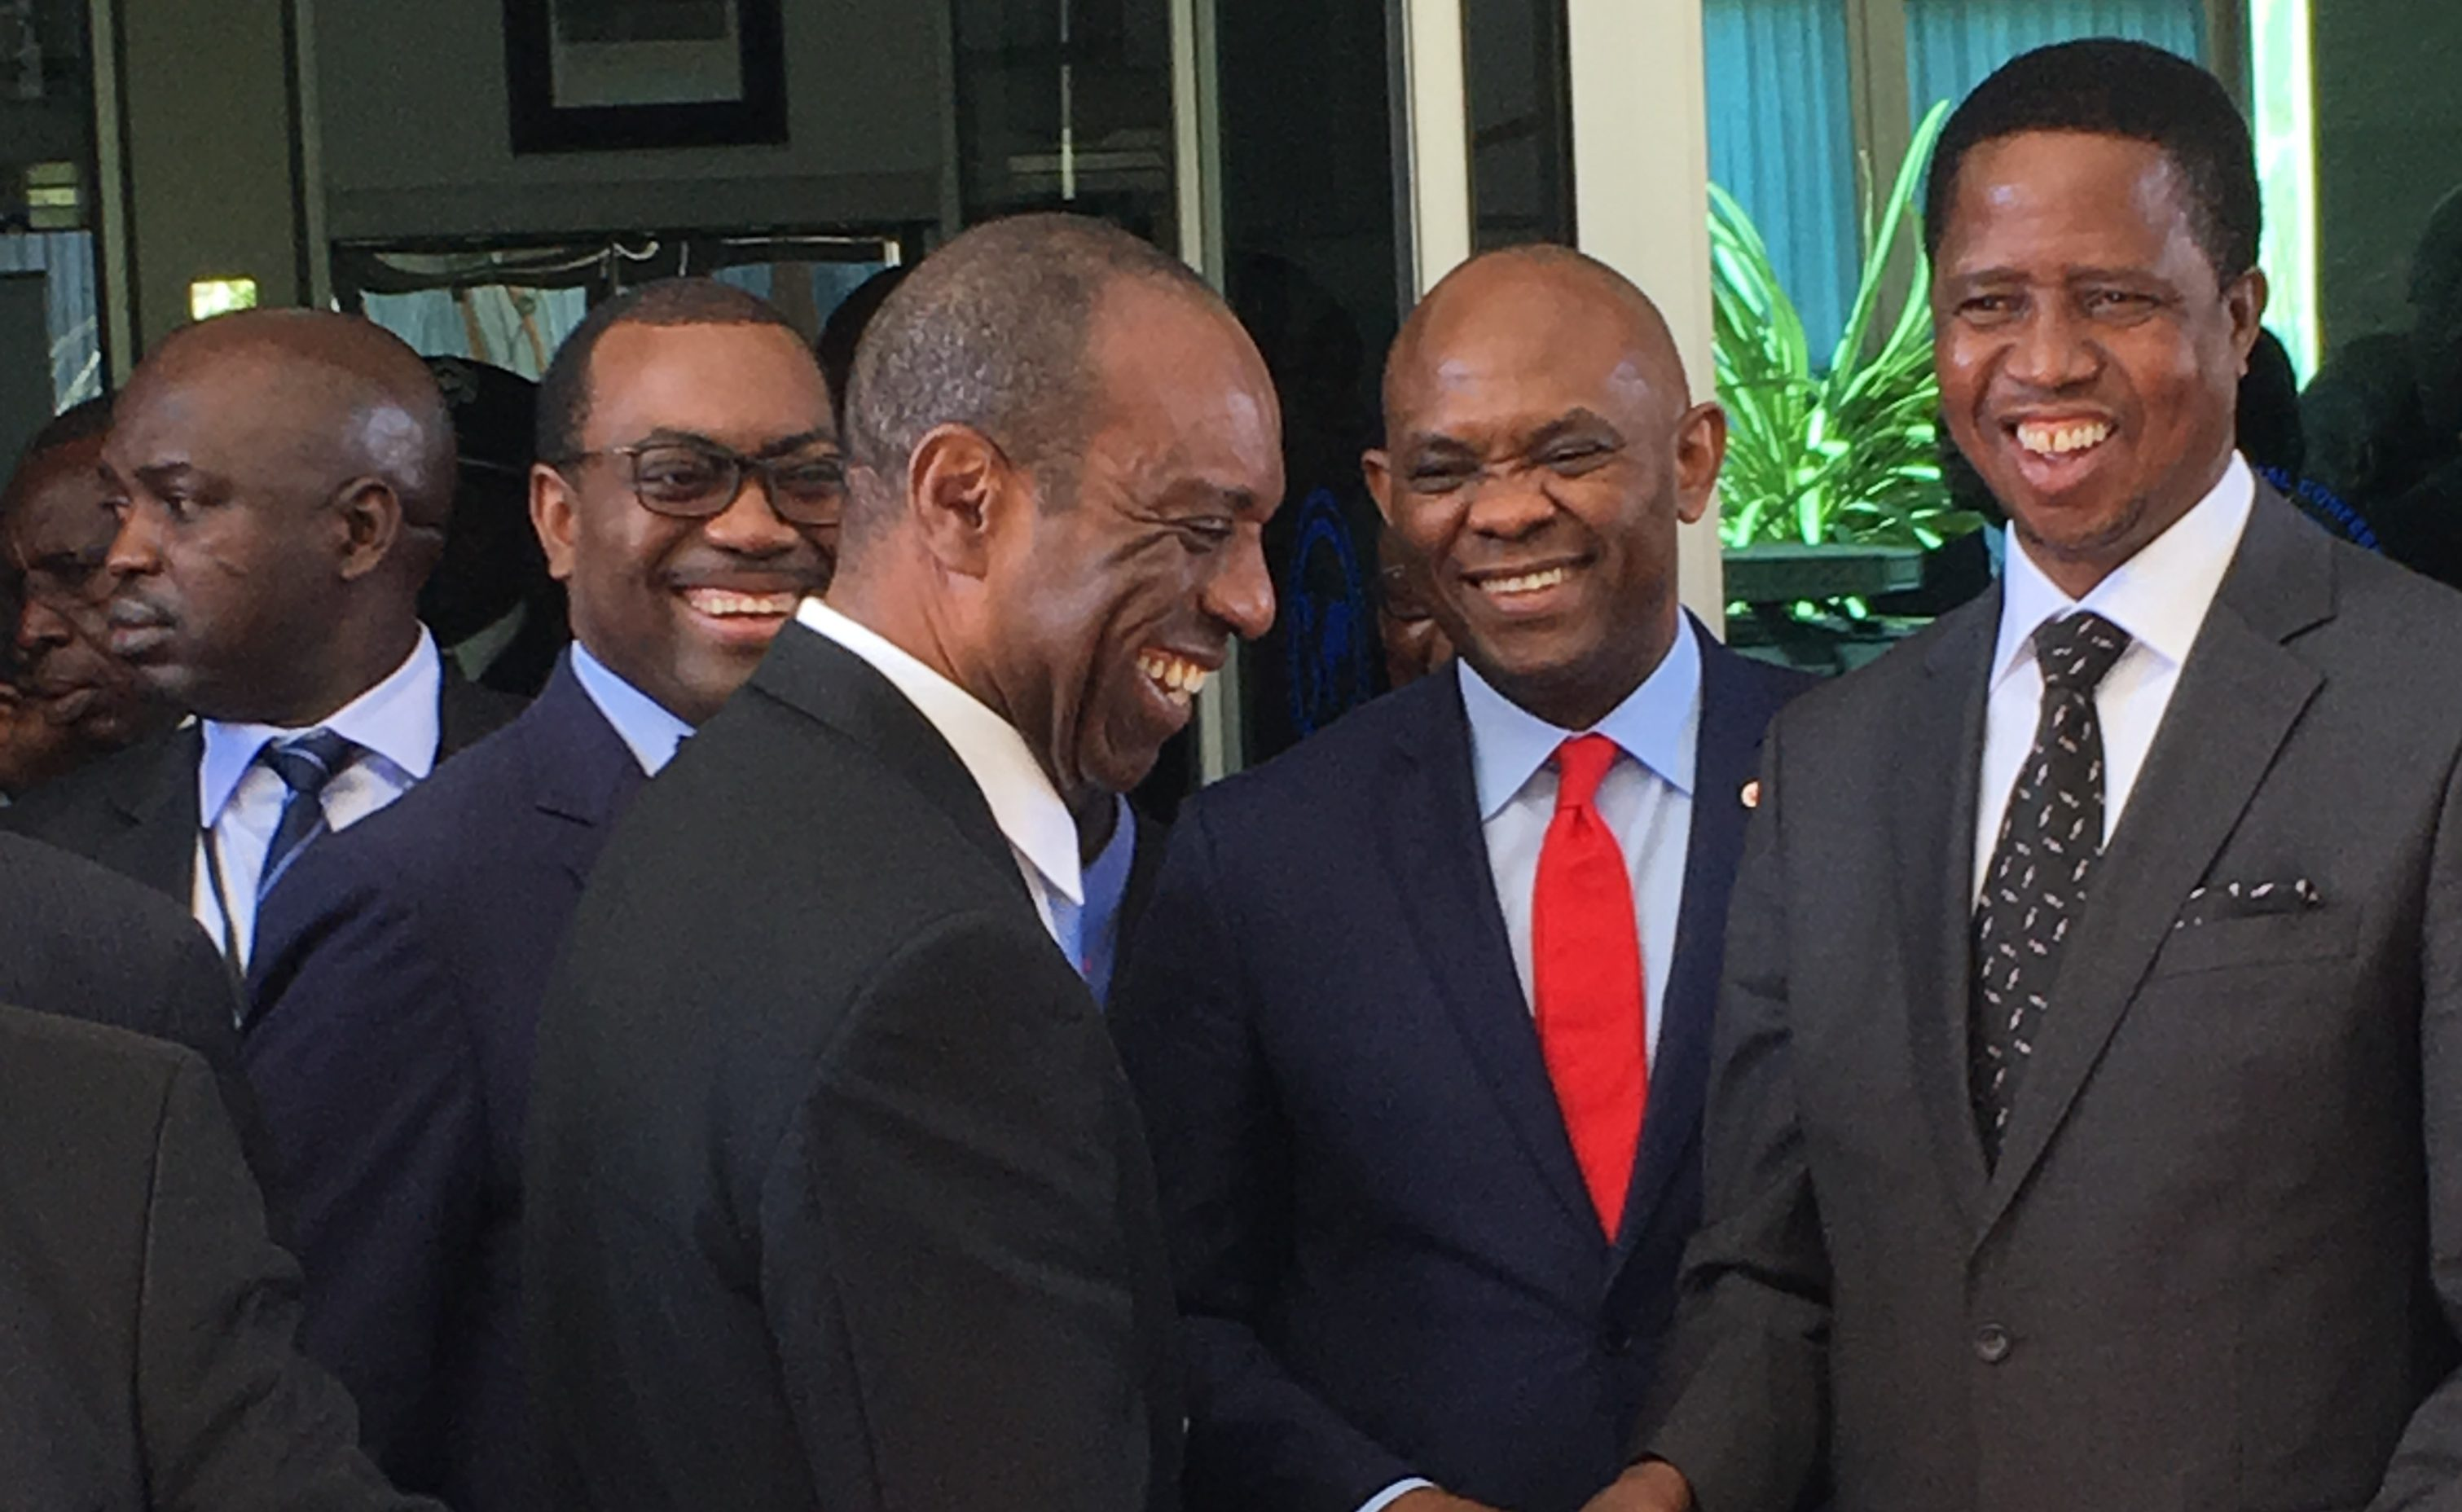 IMG 5482 e1464598745874 - Africa poised to become the engine of economic growth says Tony Elumelu